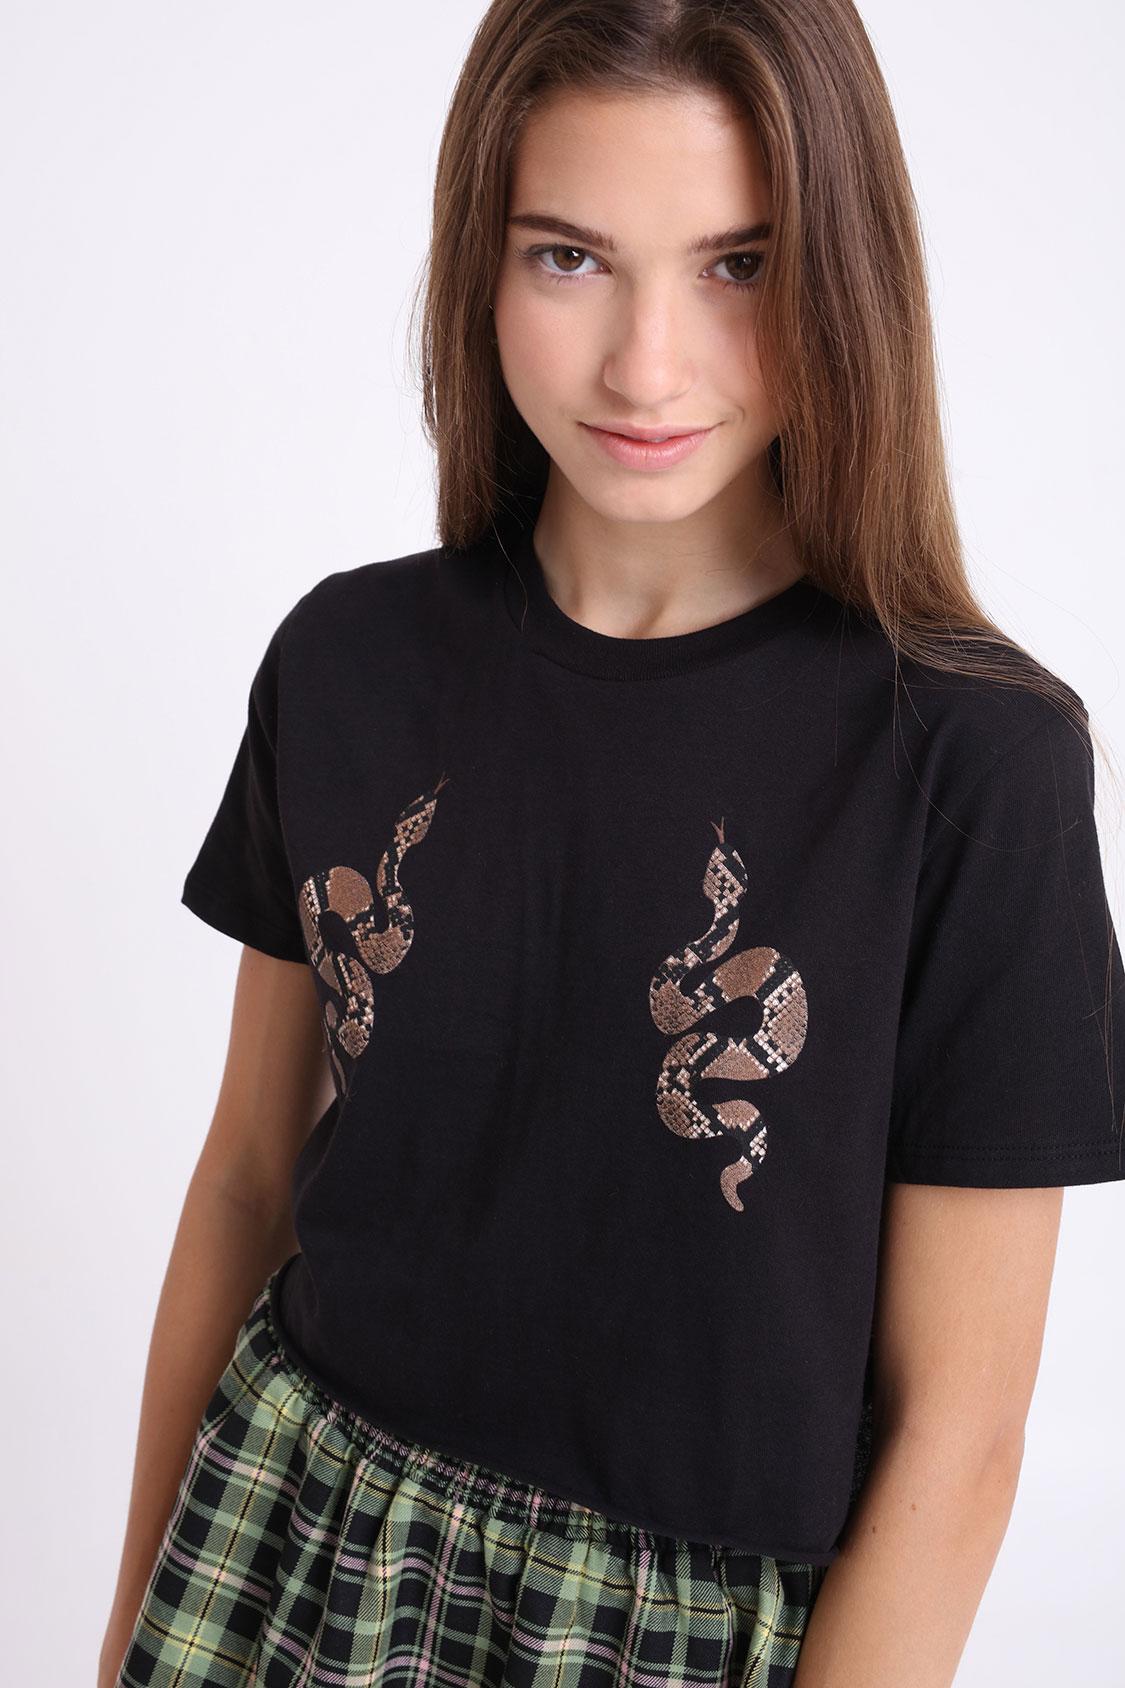 T-shirt snakes